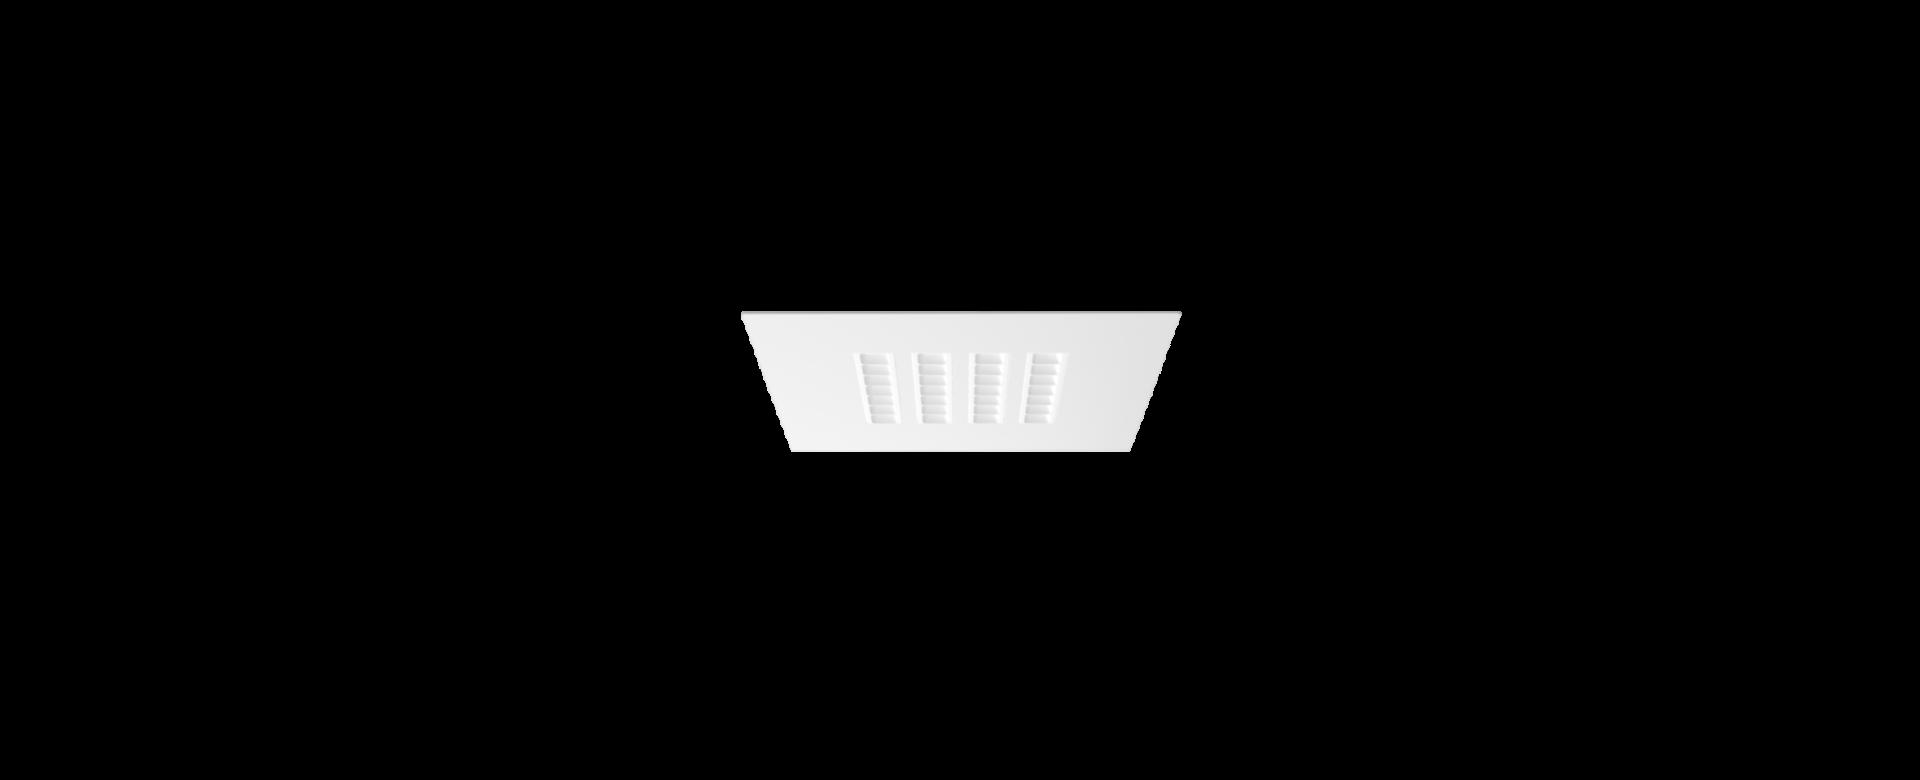 MODUX PL2 empotrado con borde reflector blanco blanco 1920x780px